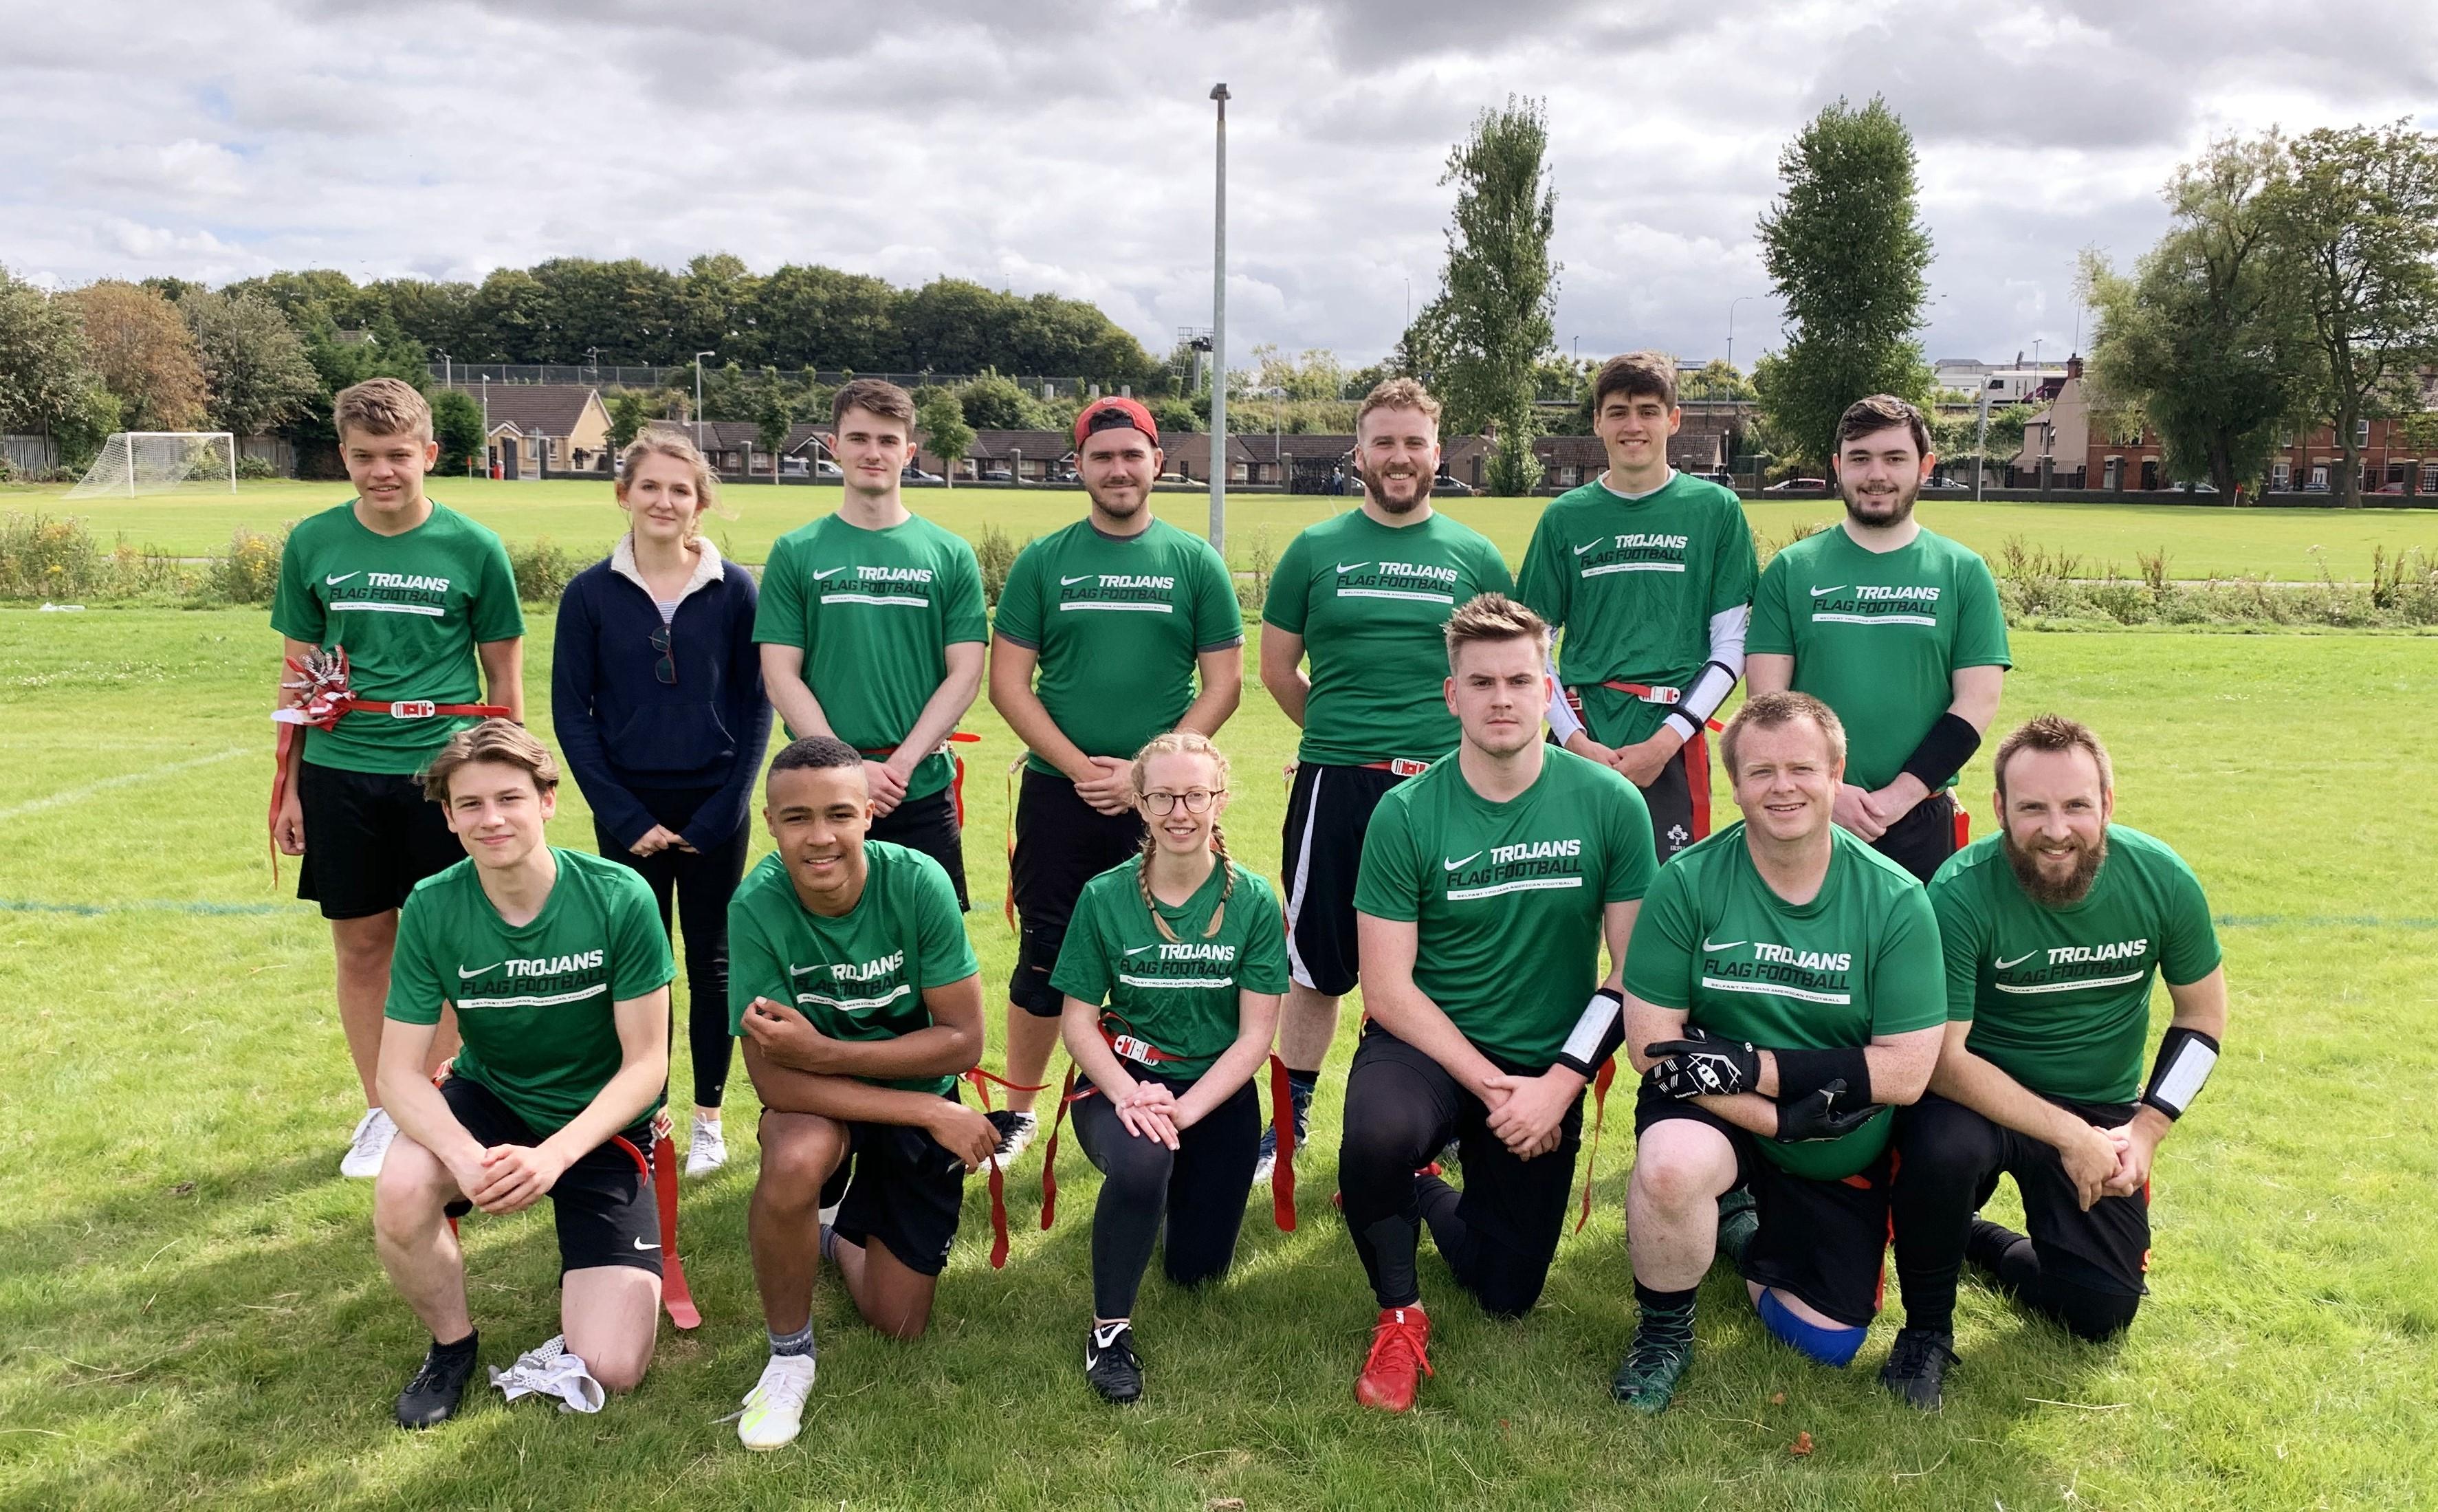 Belfast Trojans 2nd